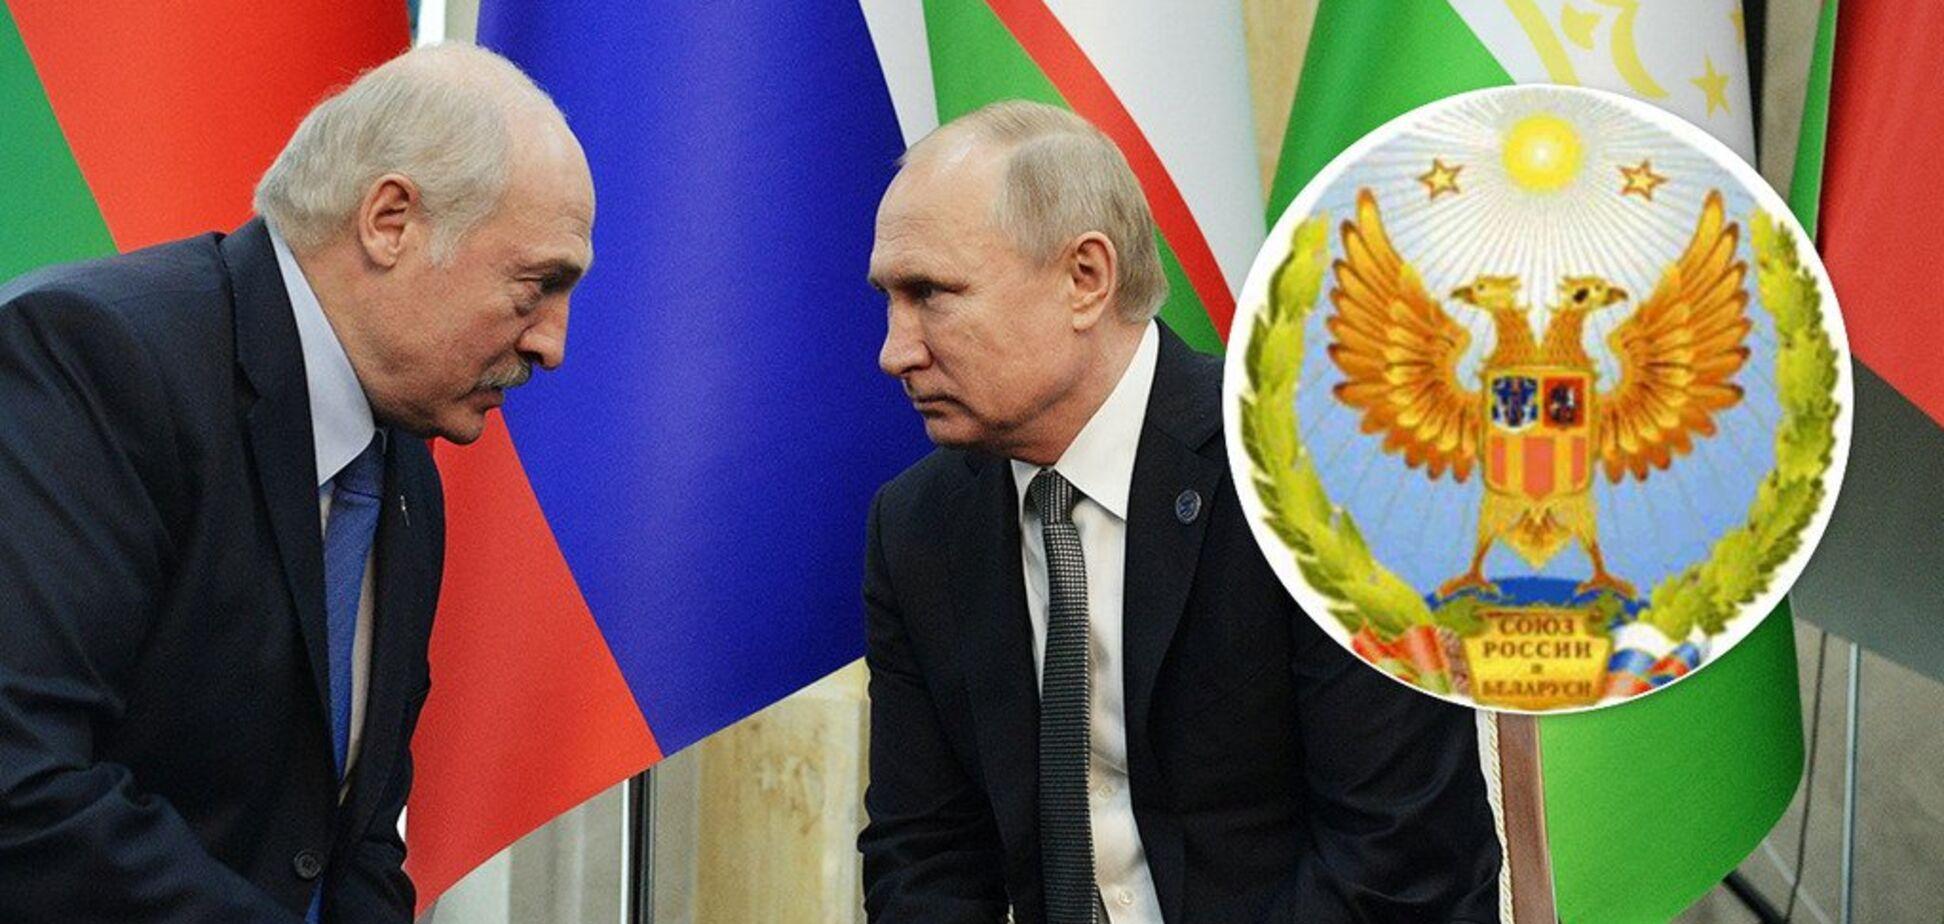 Путин против Лукашенко: как Россия шантажирует Беларусь